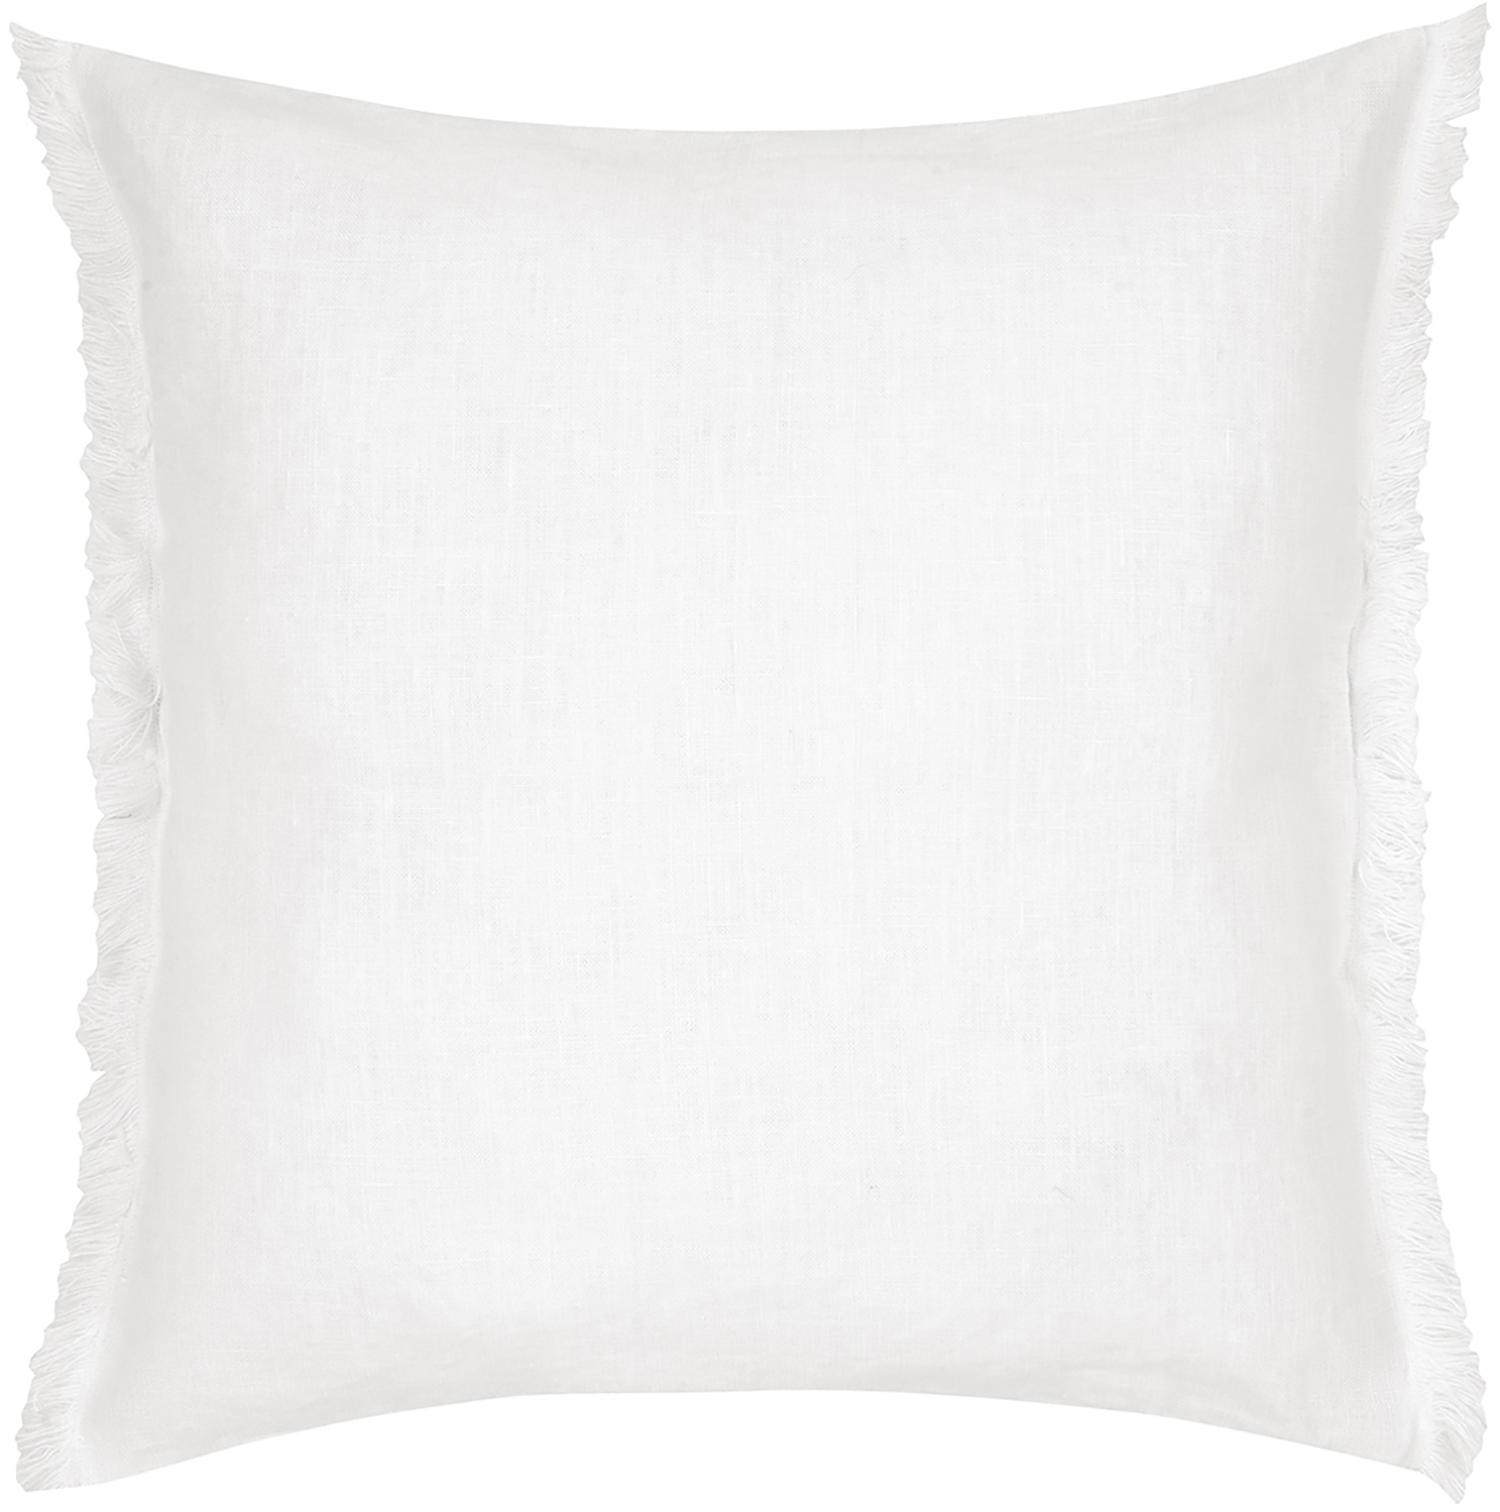 Federa arredo in lino con frange Luana, Lino, Bianco crema, Larg. 50 x Lung. 50 cm